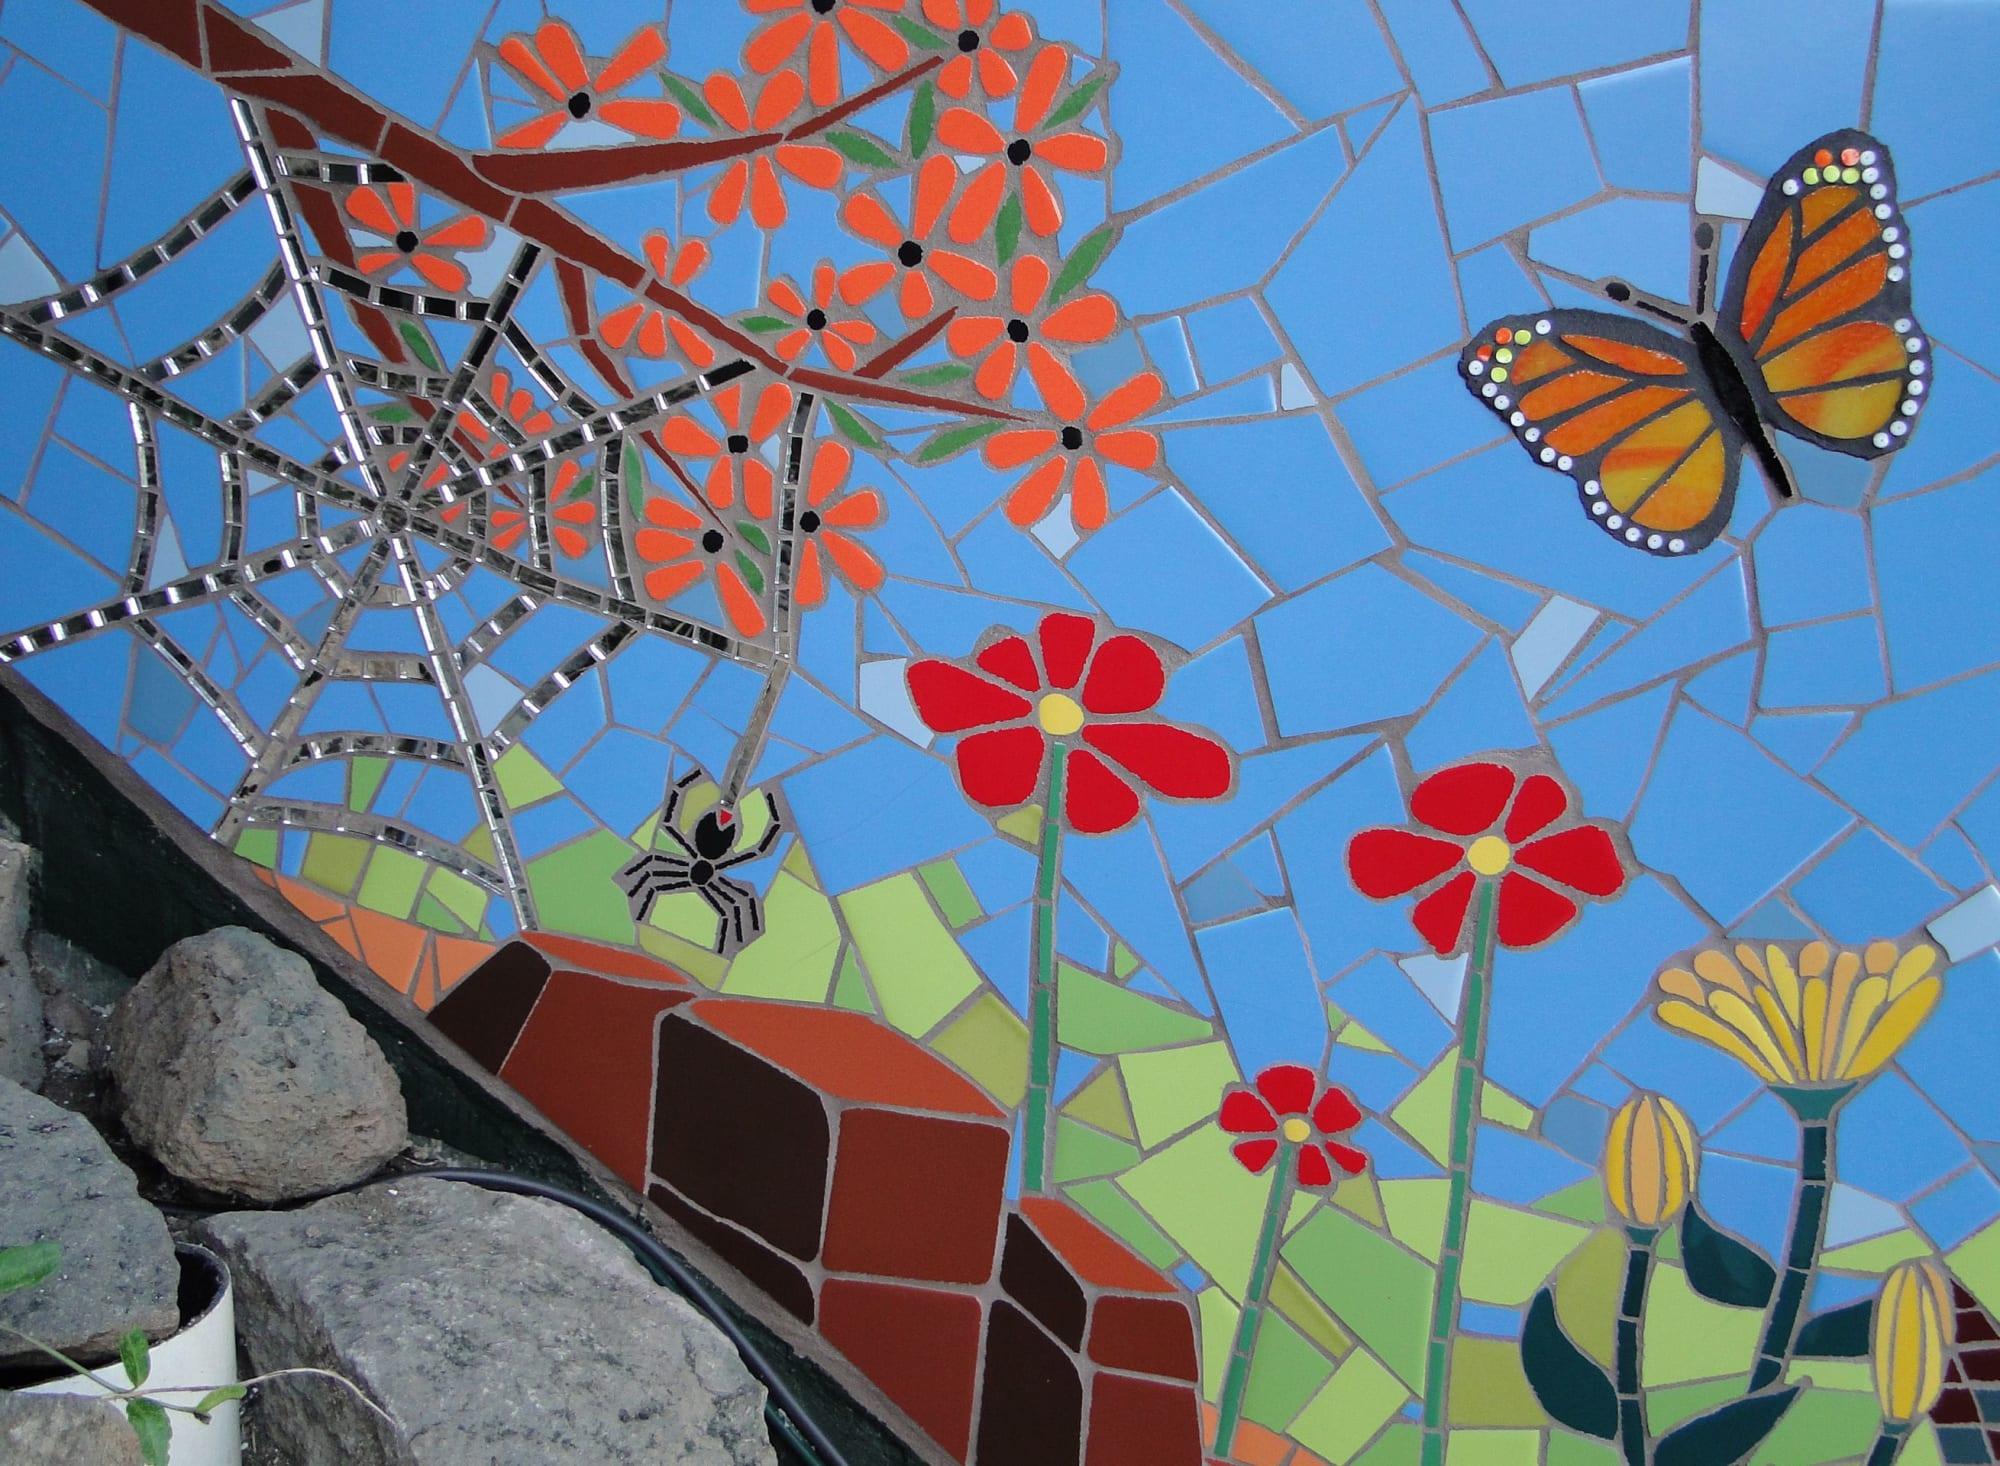 Murals by Rochelle Rose Schueler - Wild Rose Artworks LLC seen at Private Residence, Bend - Eternal Spring - exterior tile mosaic wall mural